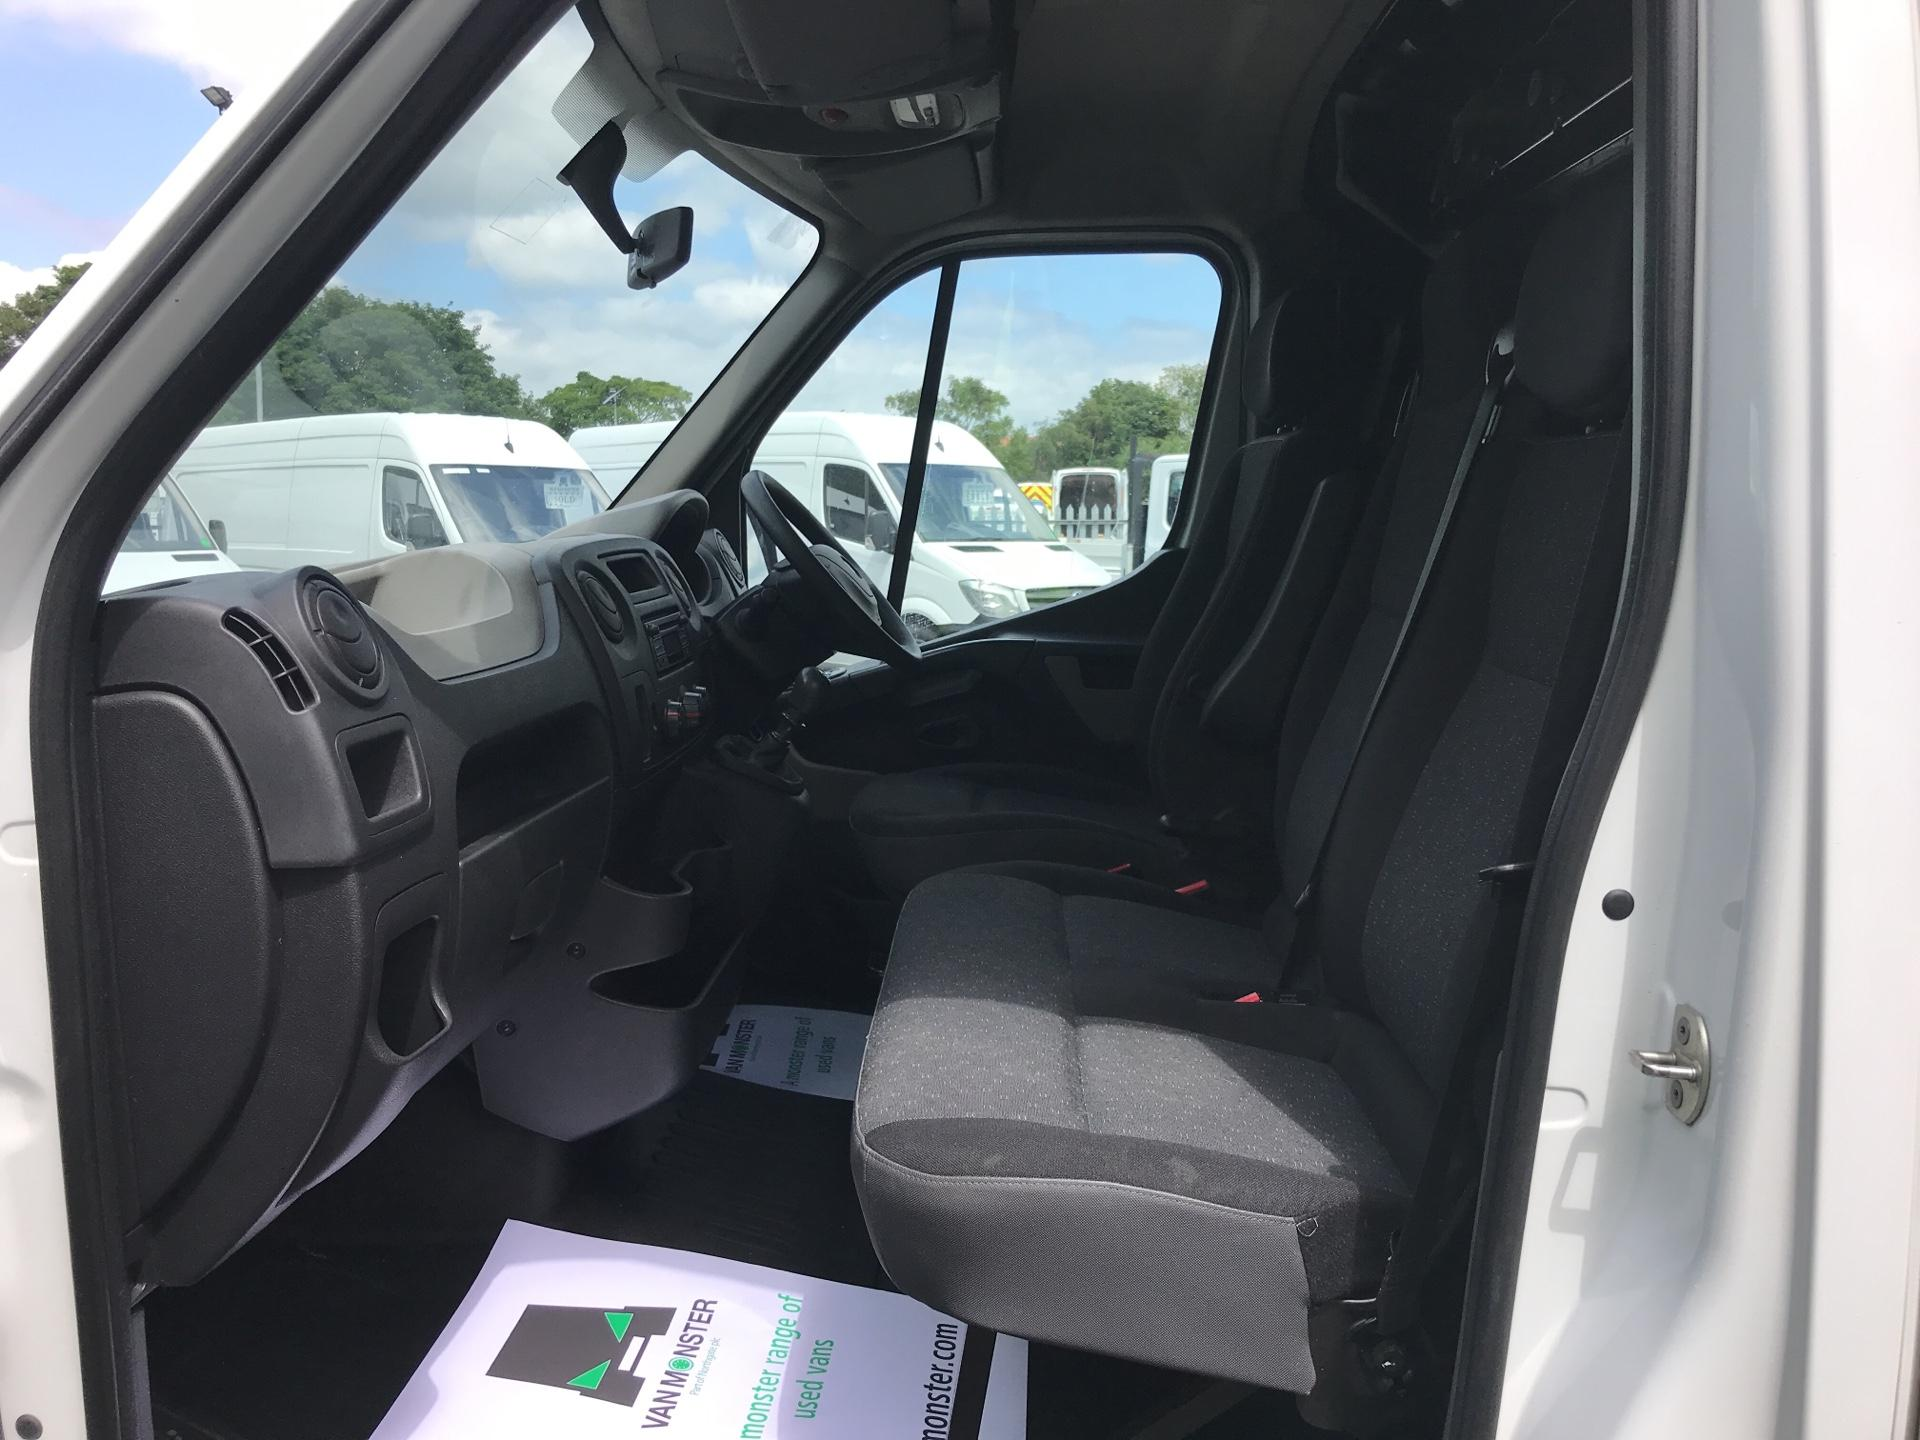 2016 Vauxhall Movano 2.3 CDTI BITURBO ECOFLEX H1 LUTON 136PS (DT65AED) Image 14